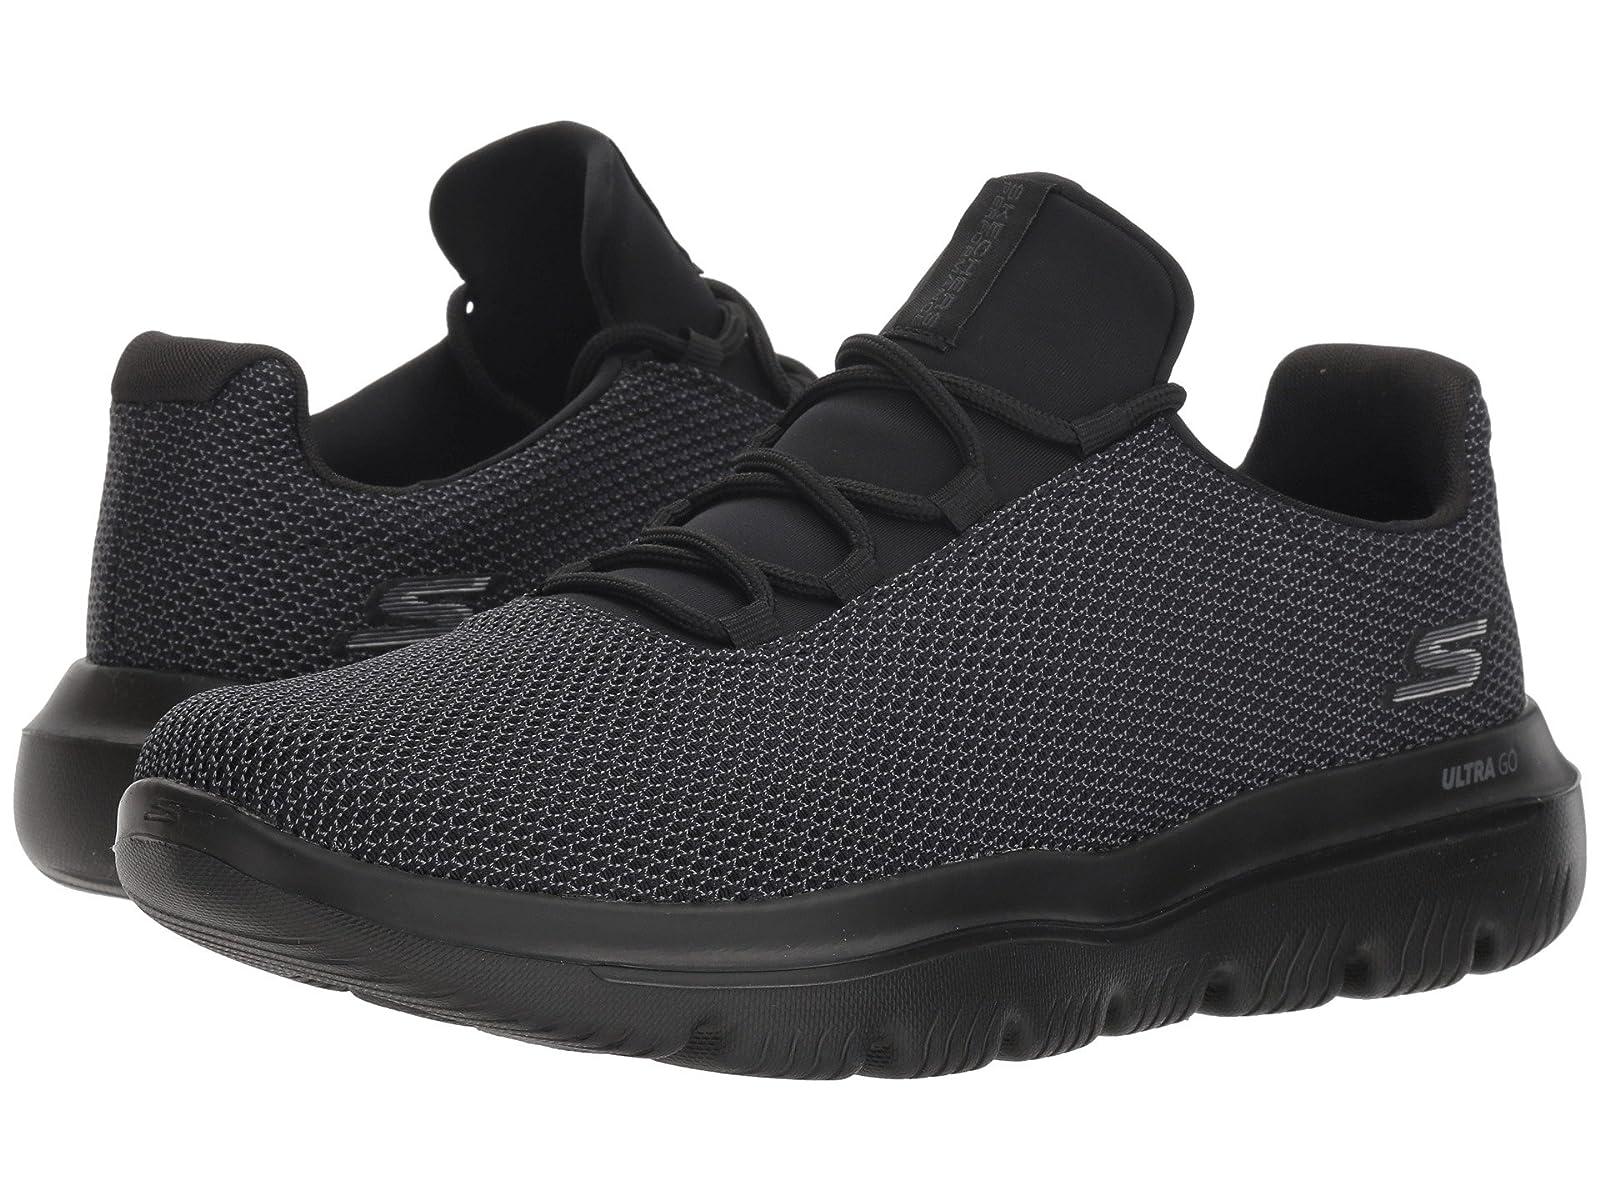 SKECHERS Performance Go Walk Evolution Ultra InitiateAtmospheric grades have affordable shoes